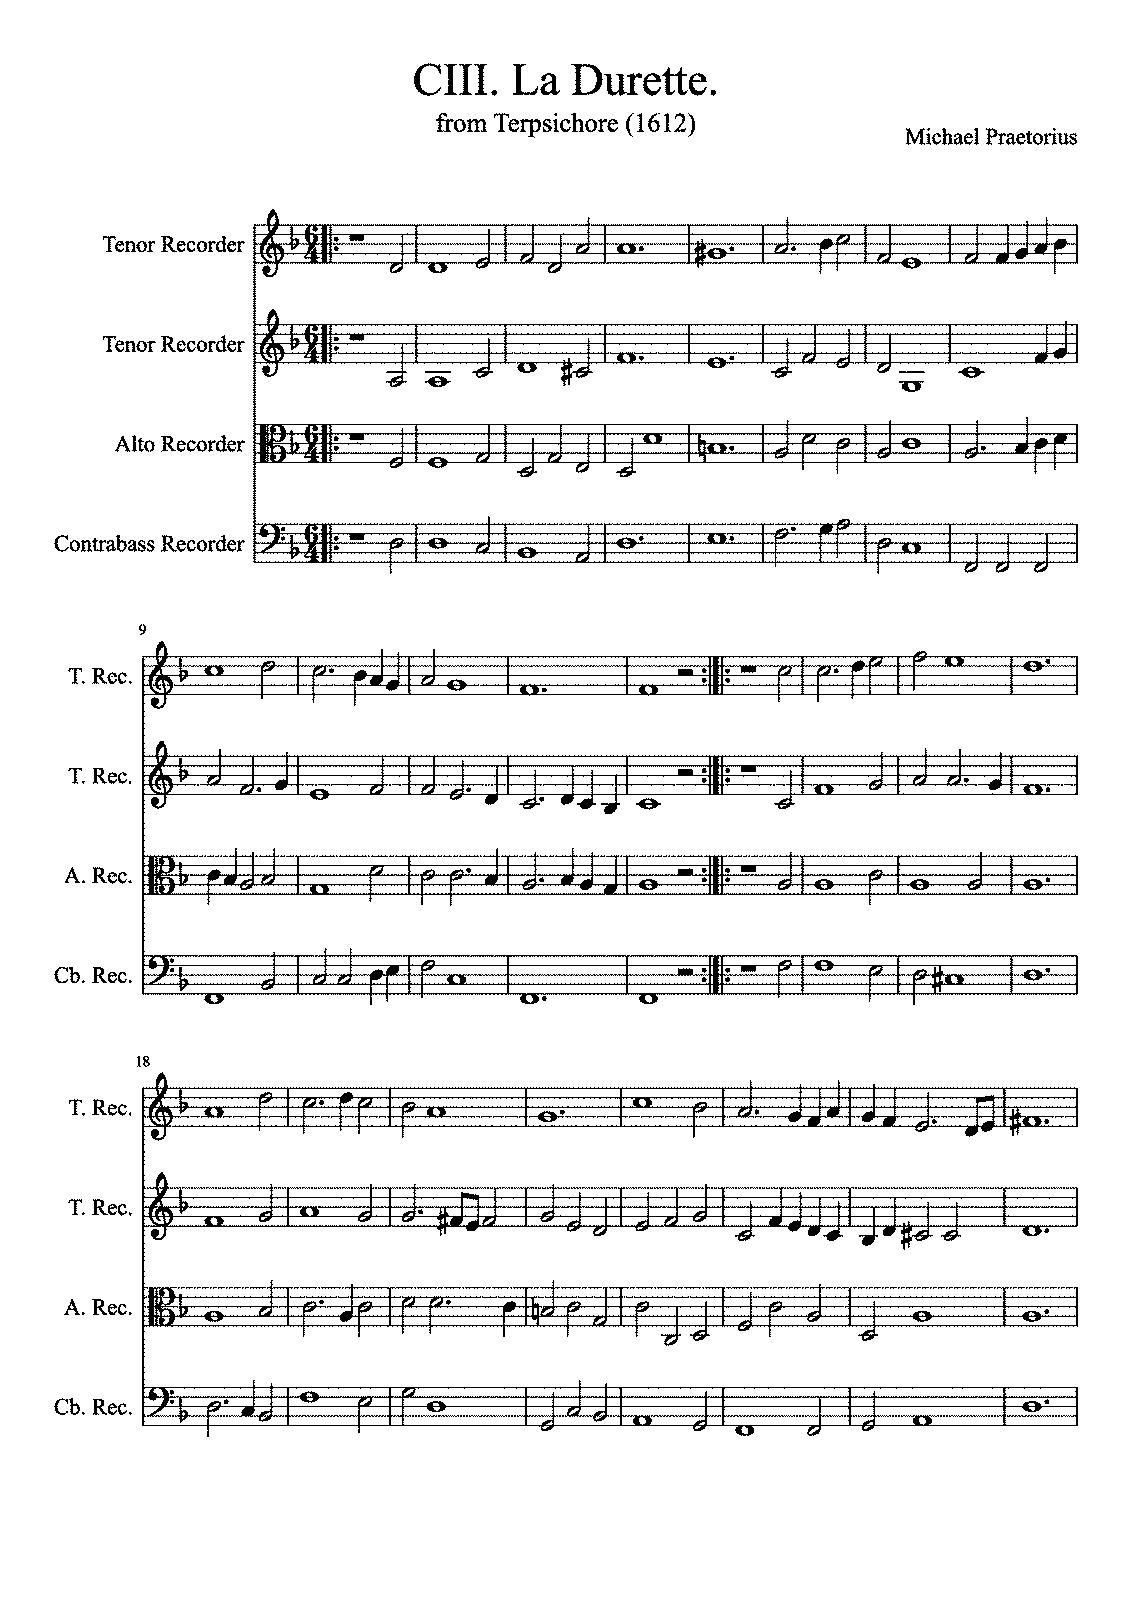 la durette, tma 103 (praetorius, michael) - imslp: free sheet music pdf  download  imslp